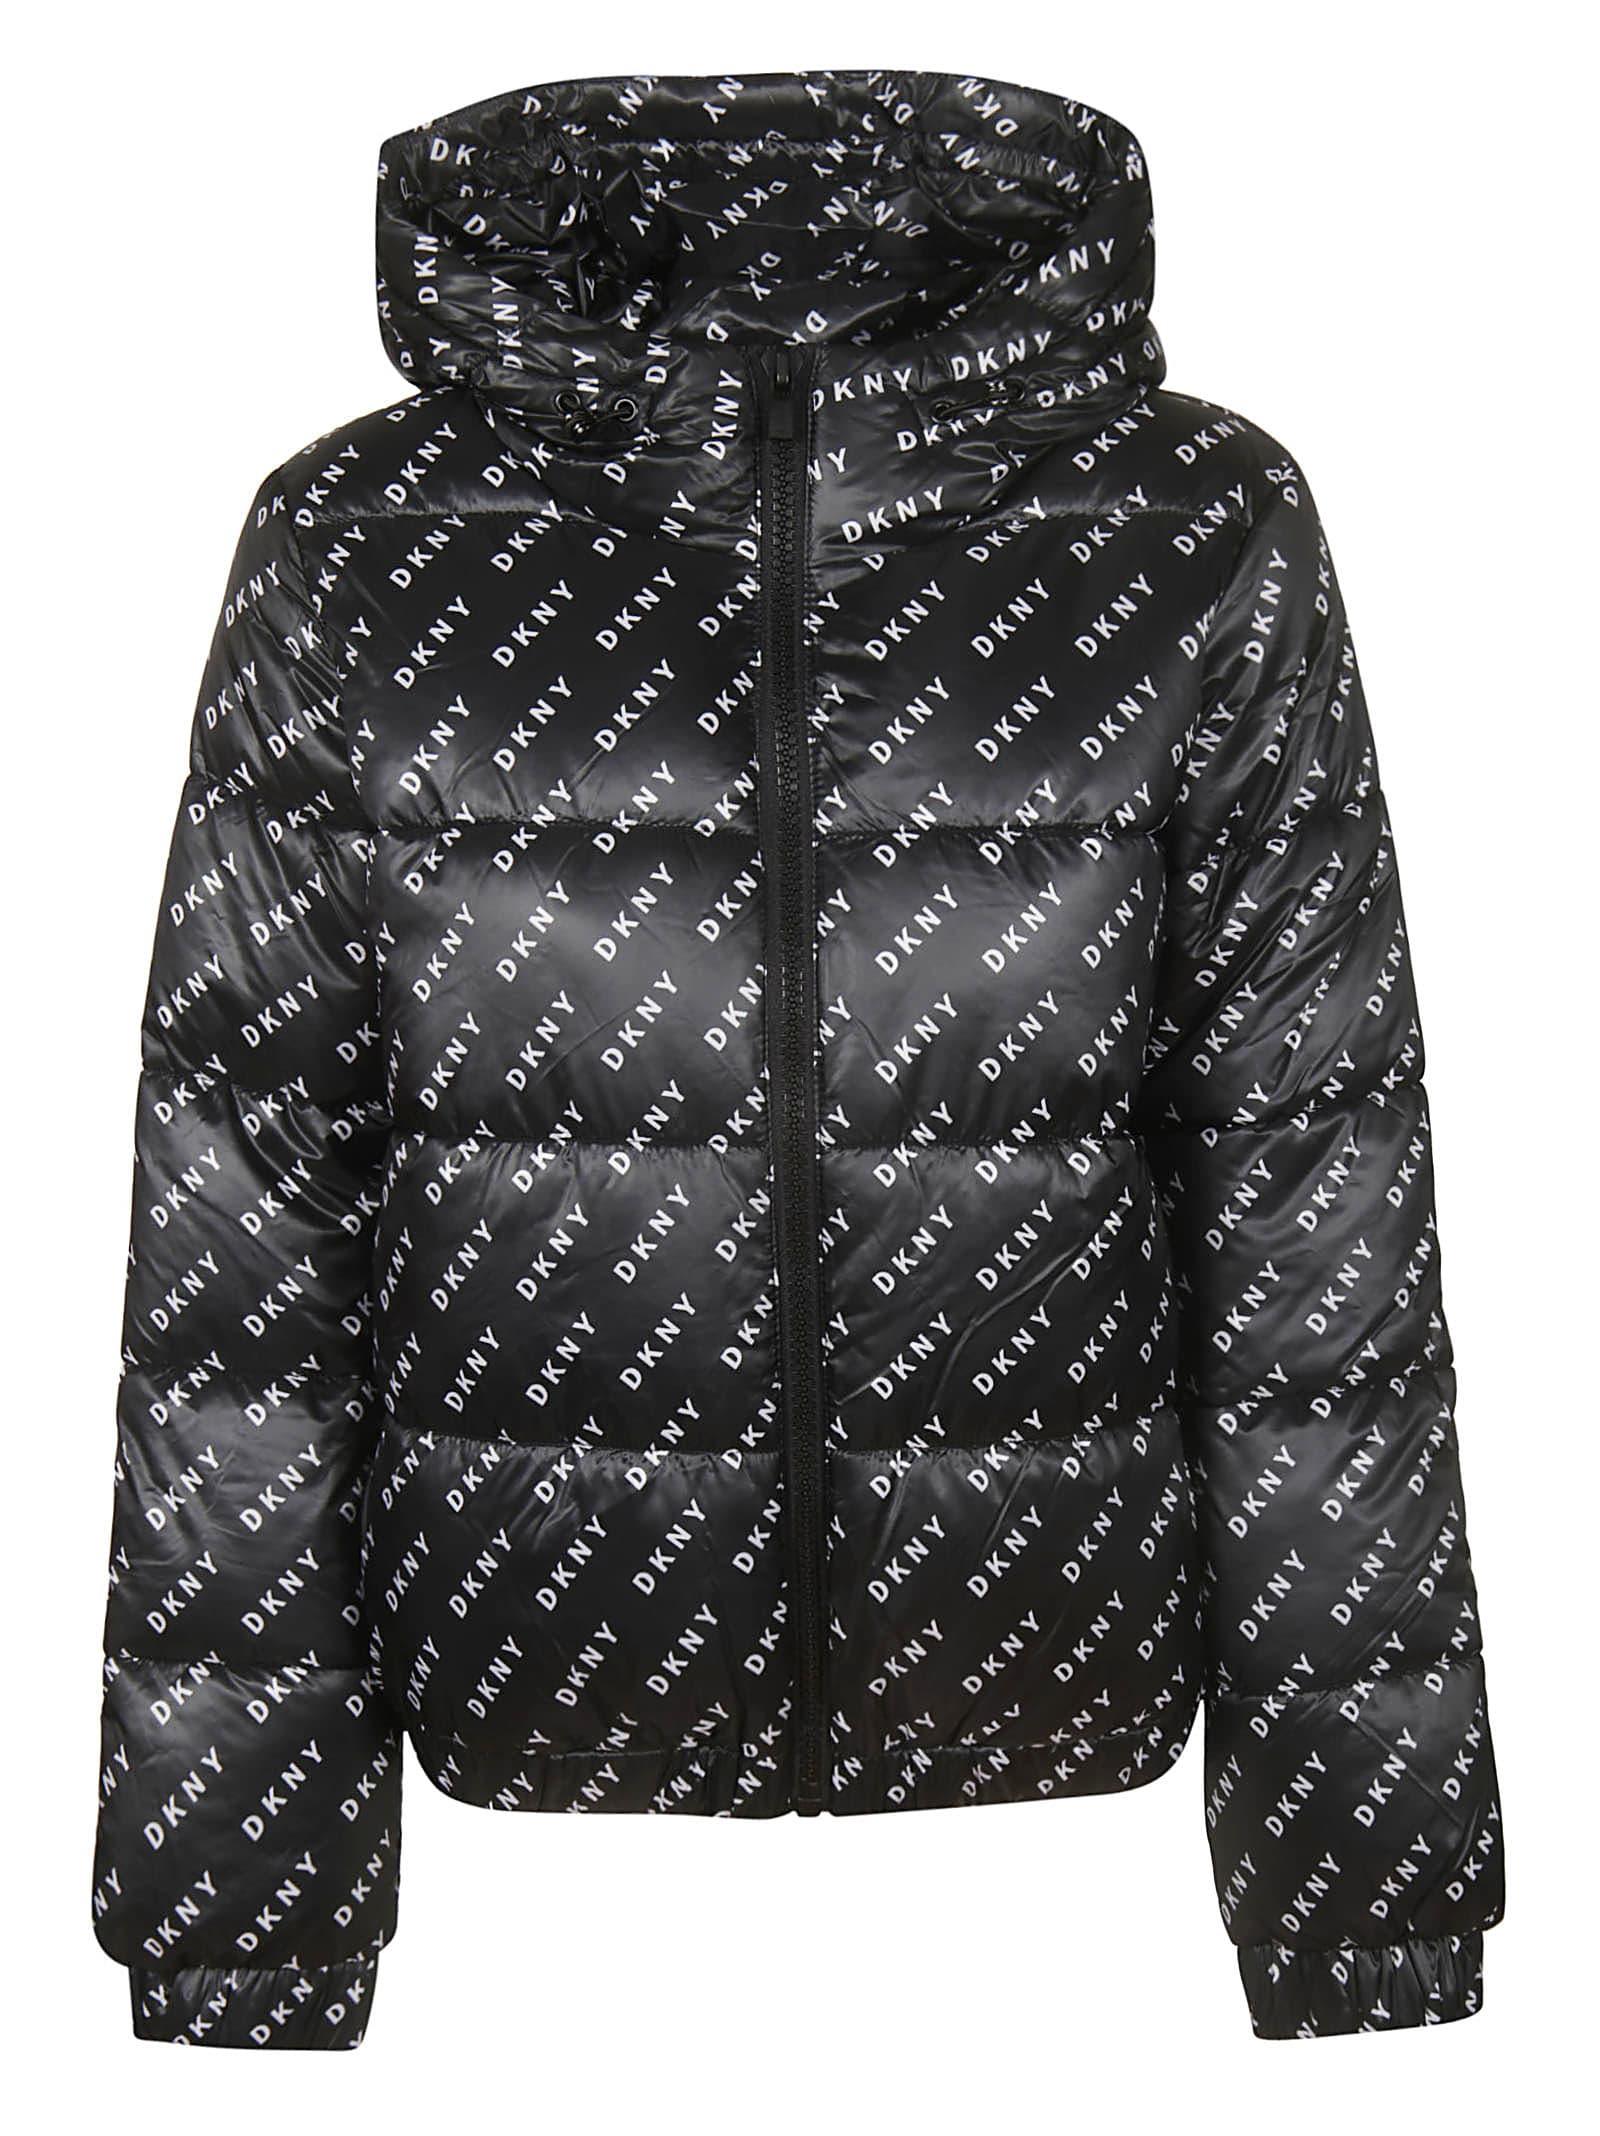 DKNY All Over Print Padded Jacket